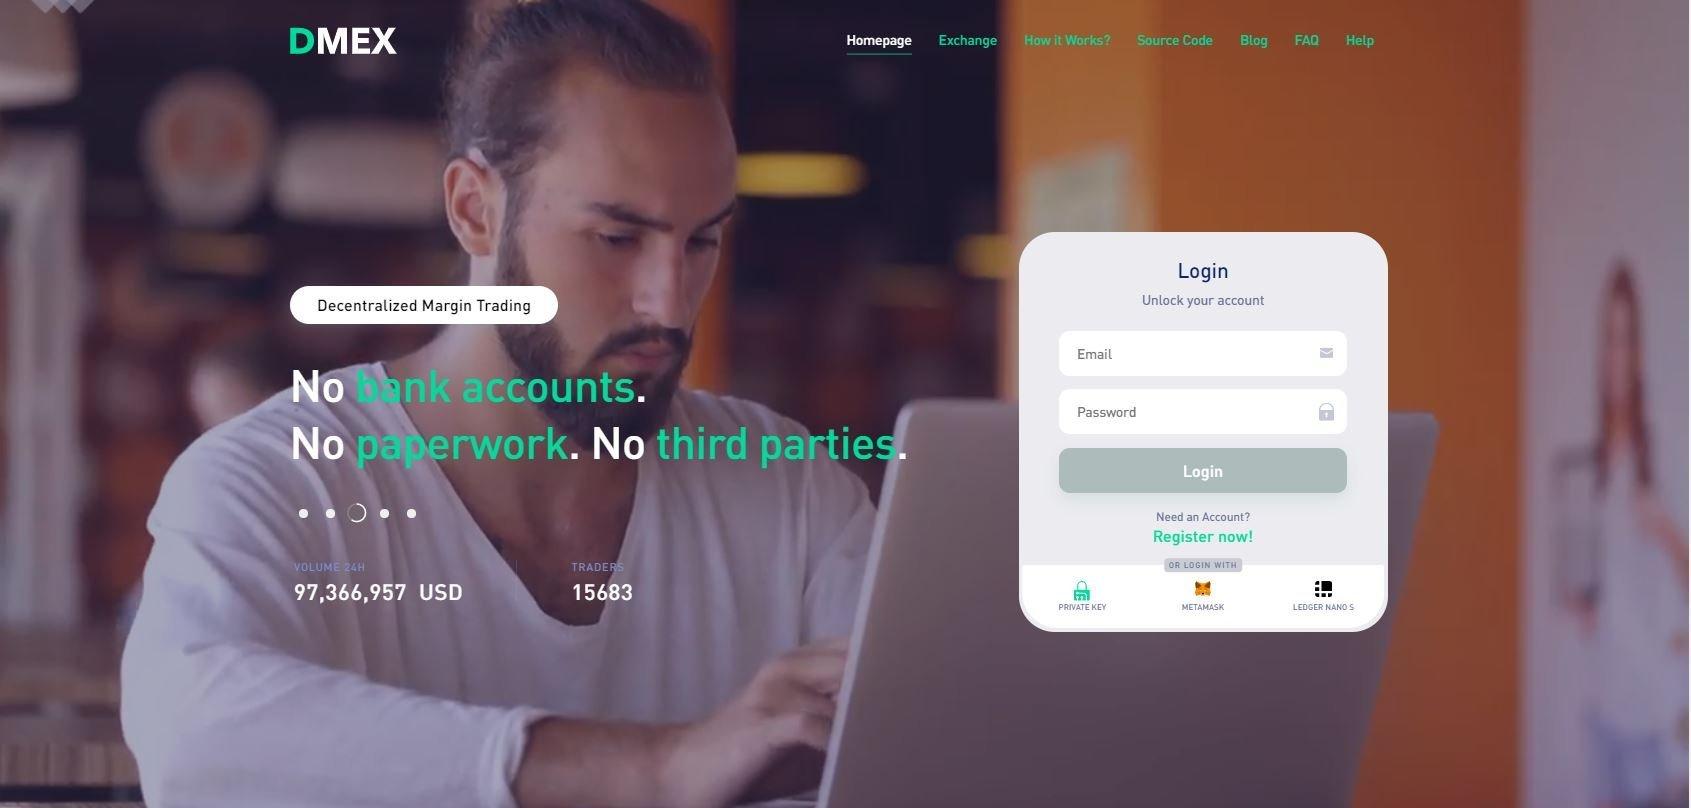 dmex.app